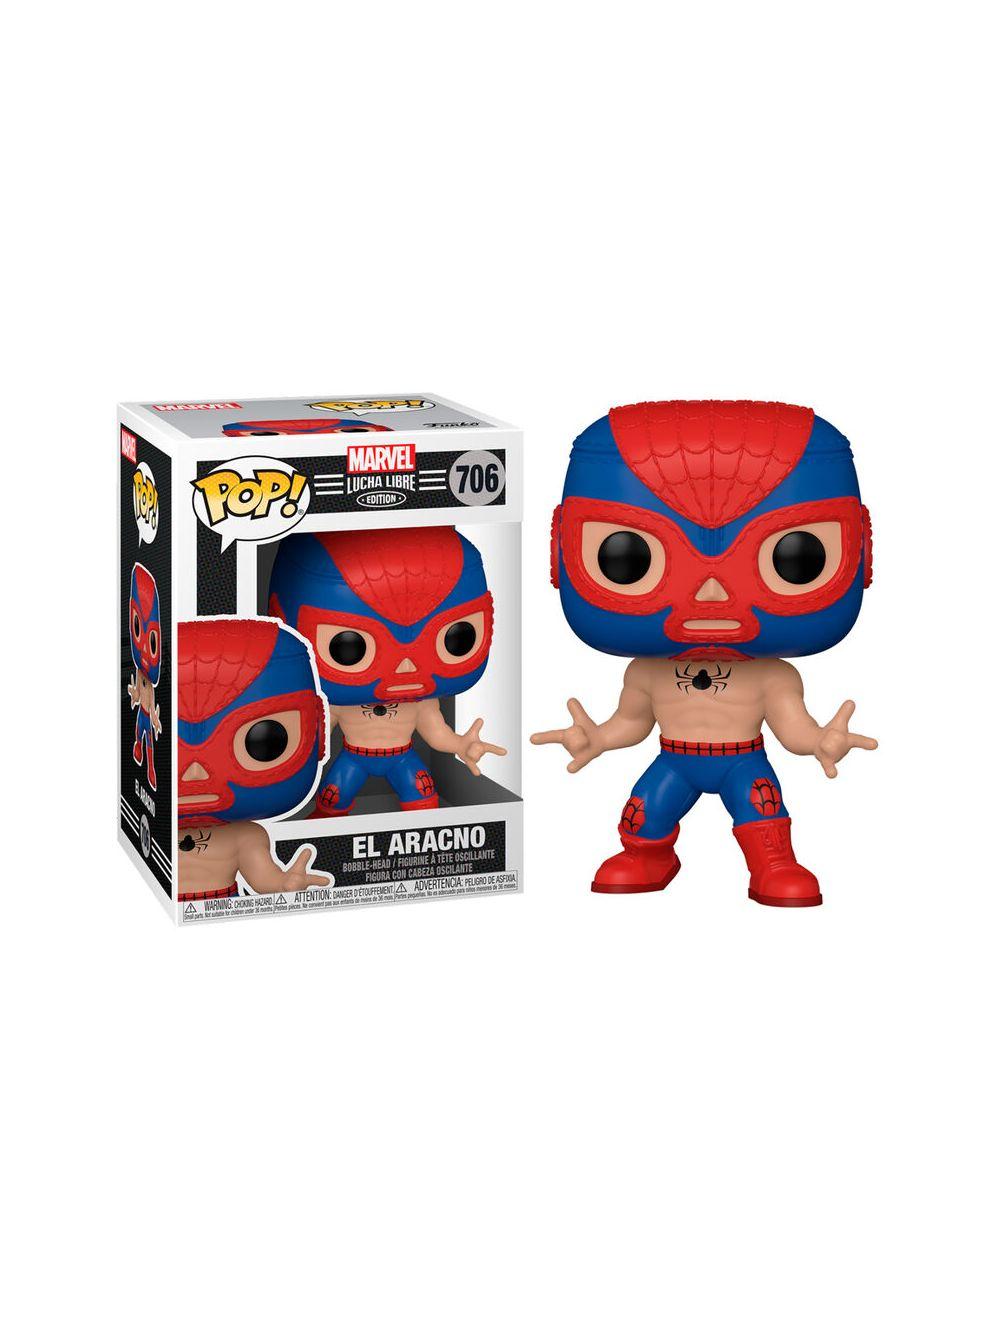 Funko POP! Marvel Lucha Libre - Spider-Man Vinyl figura 10cm